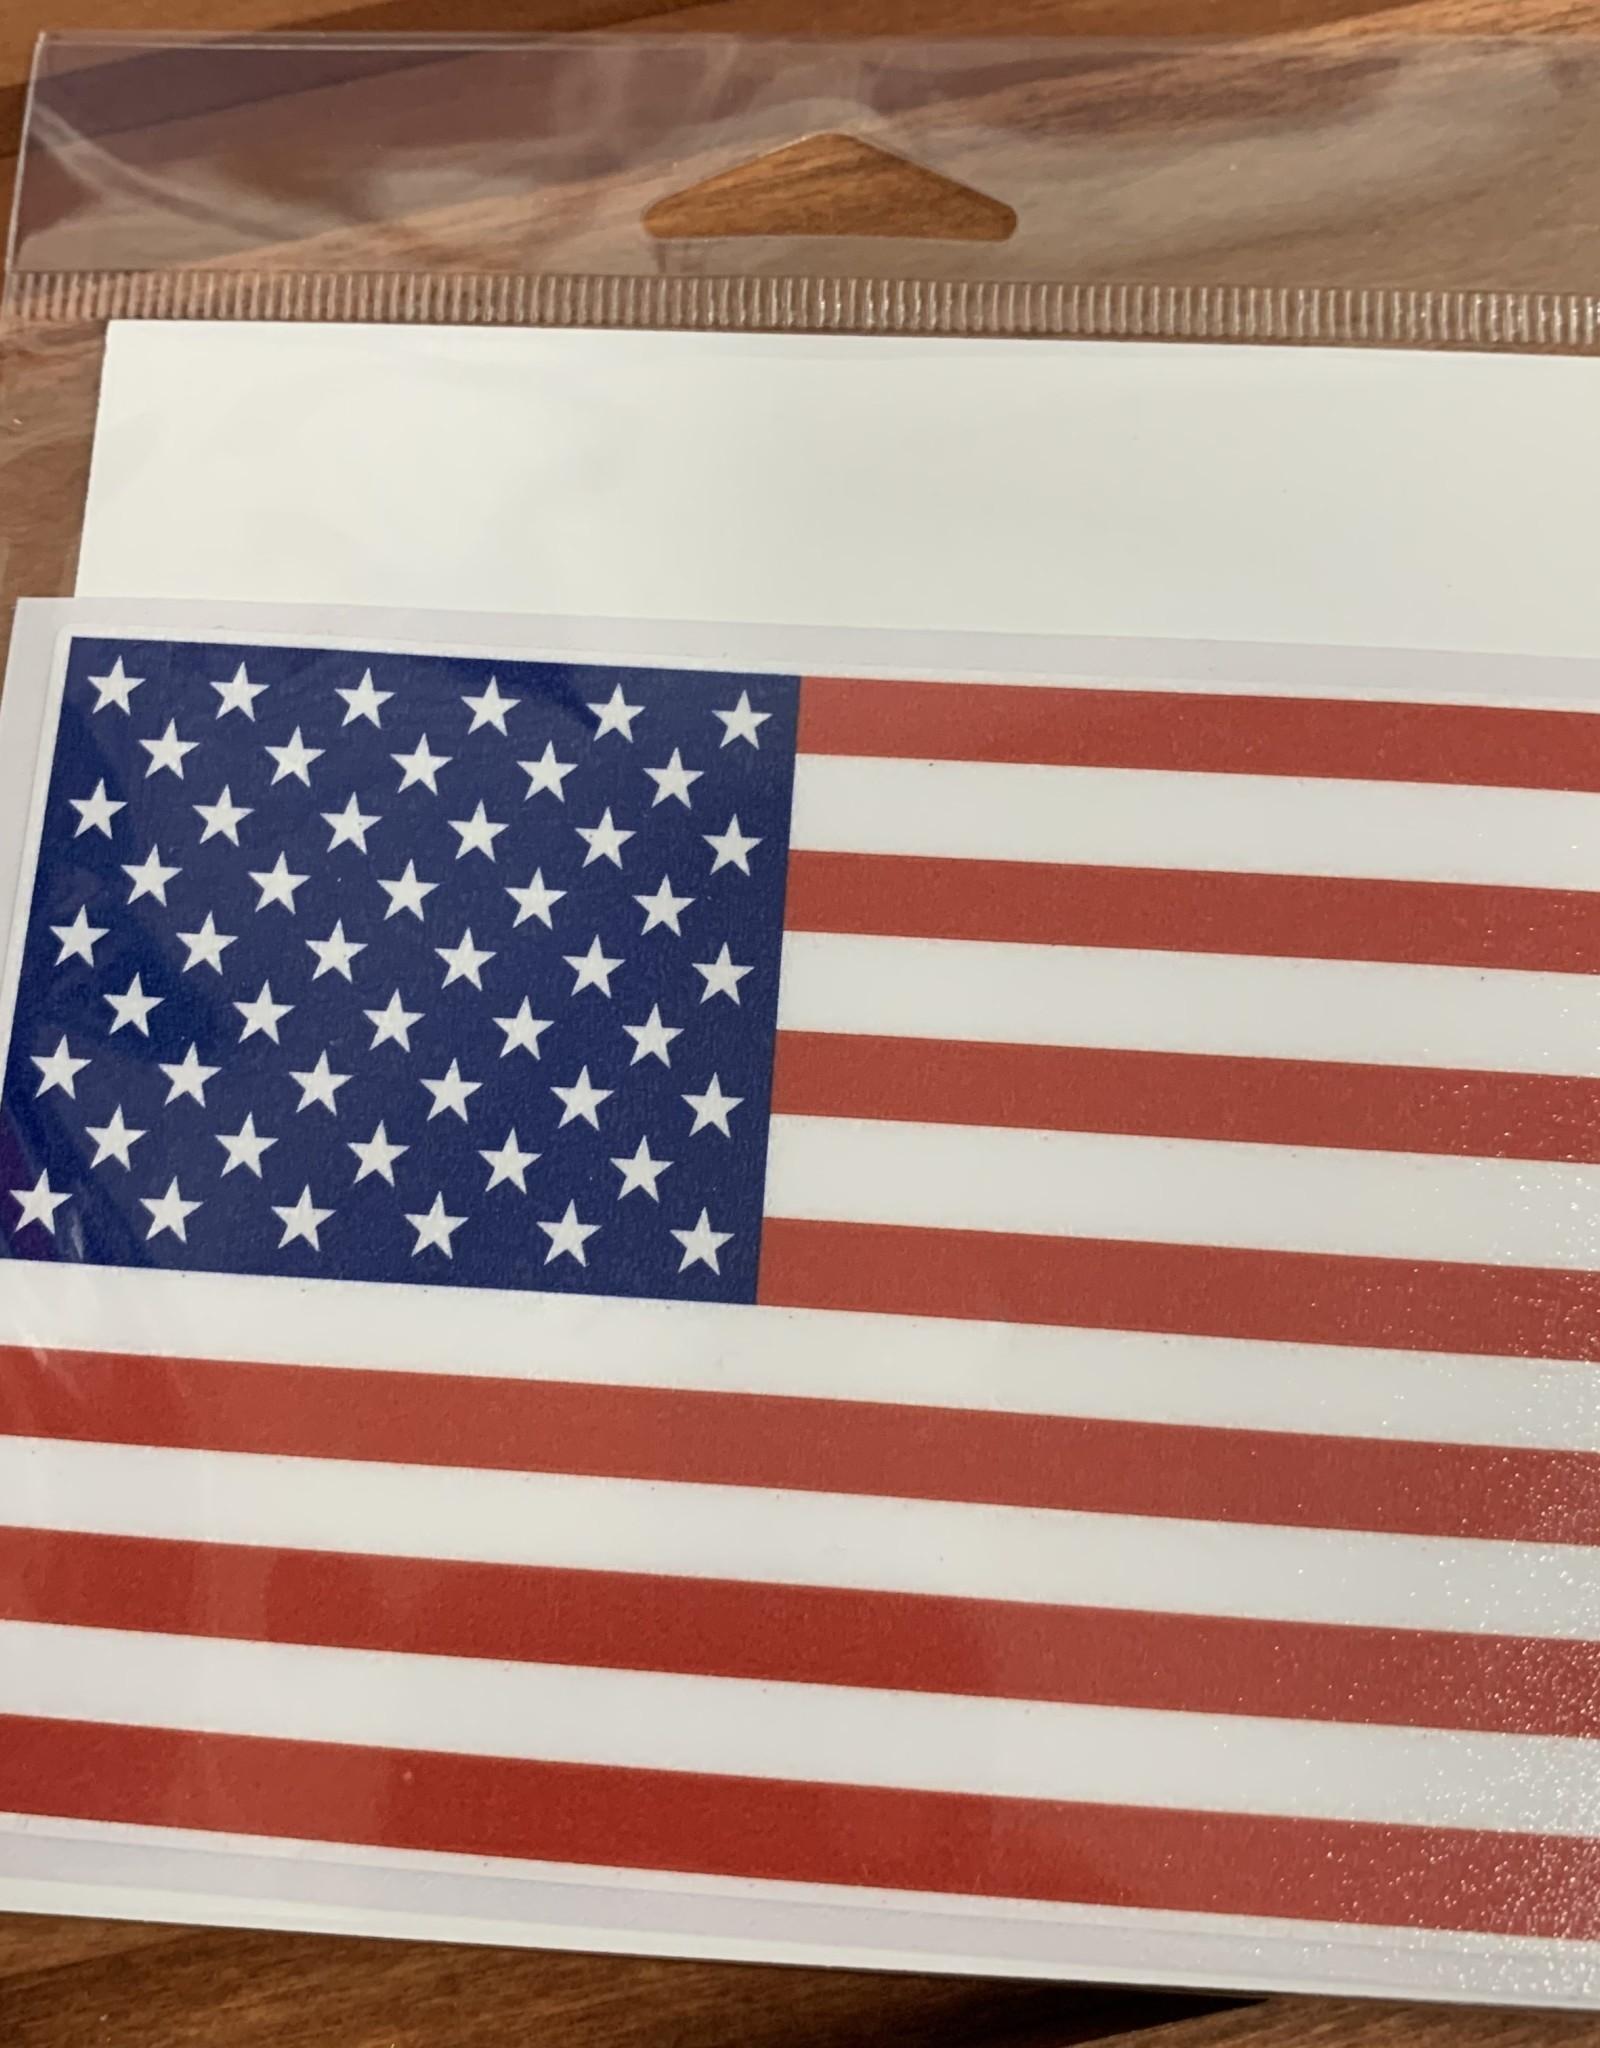 USA FLAG STICKER (LARGE)